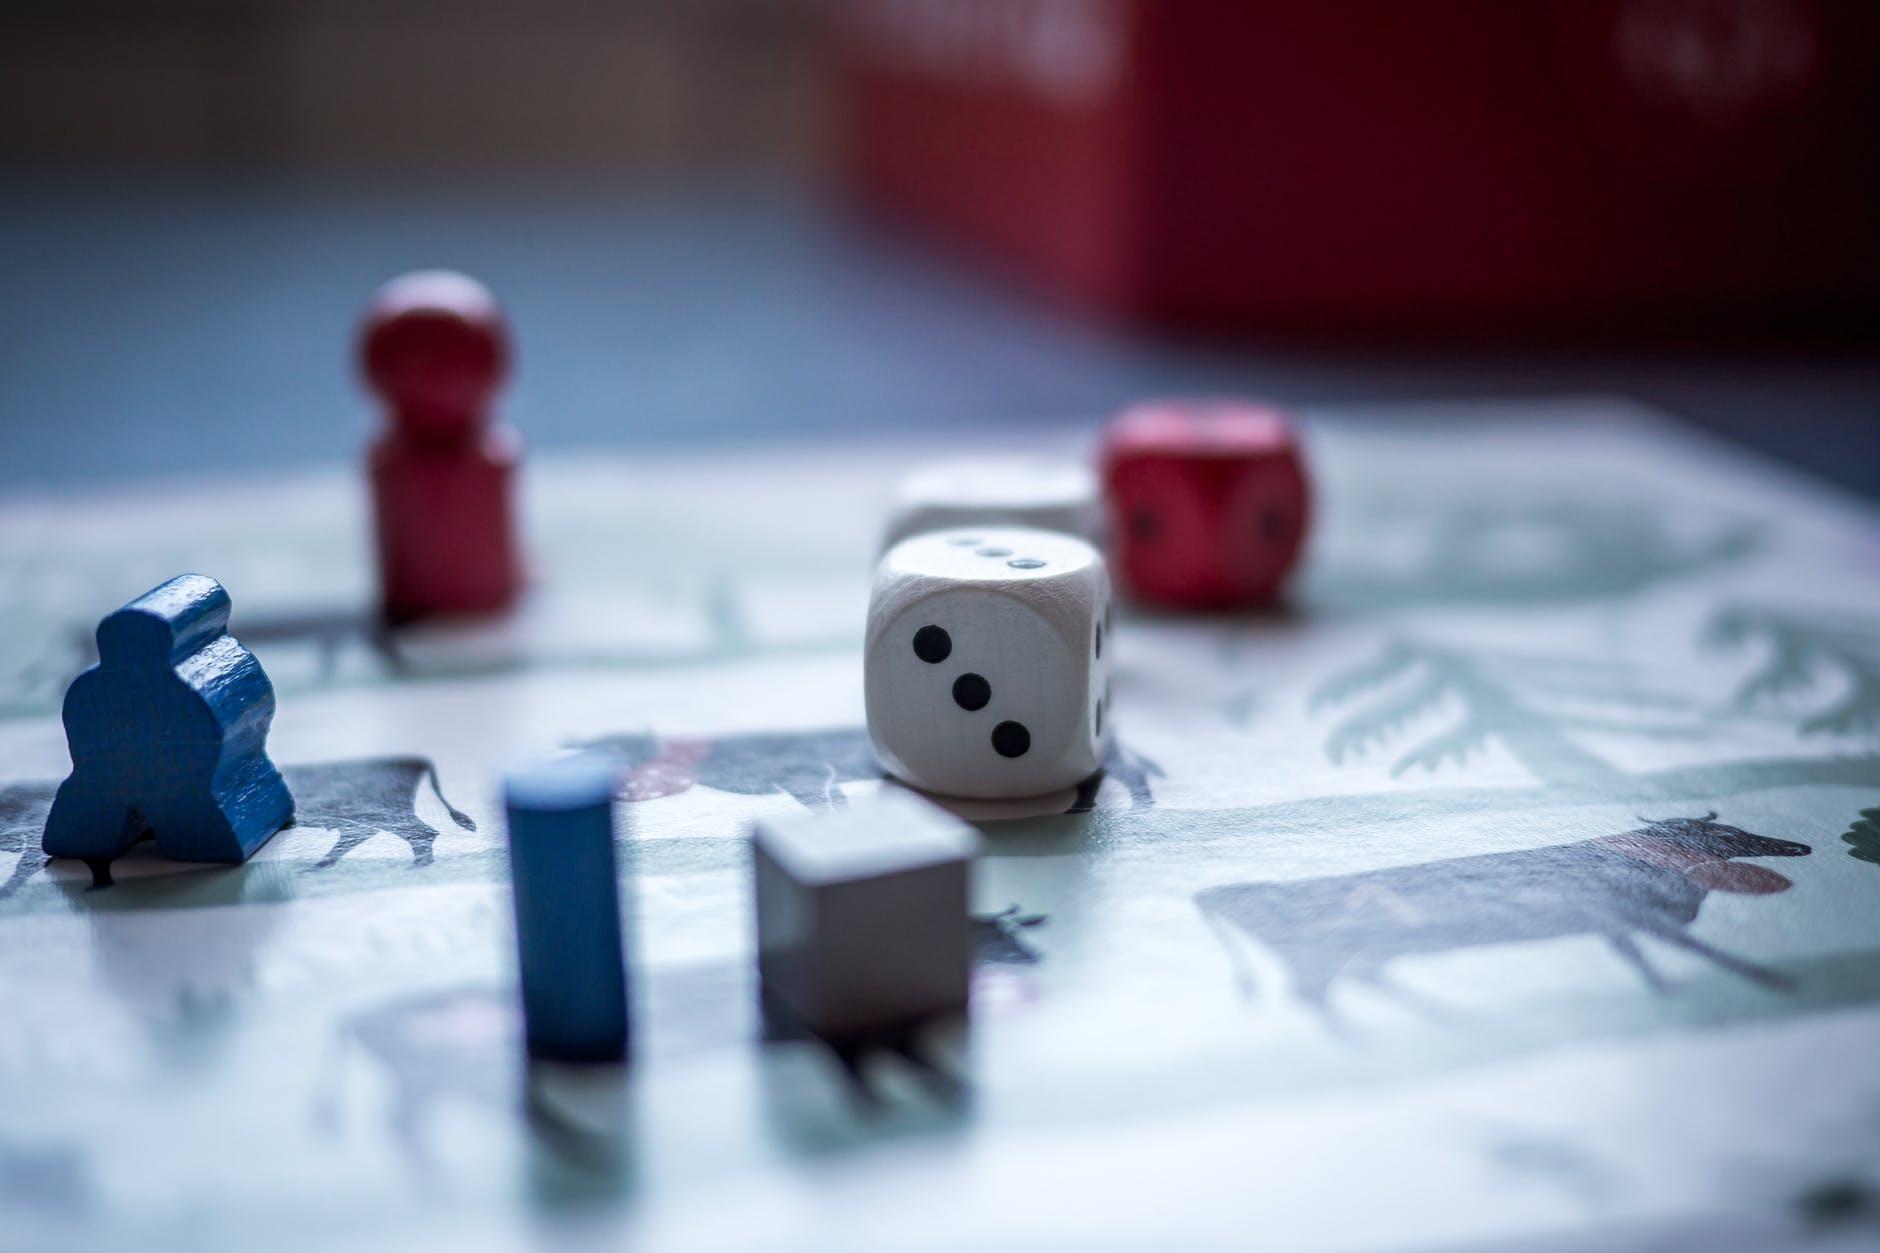 Mensa Games jocuri educaționale online